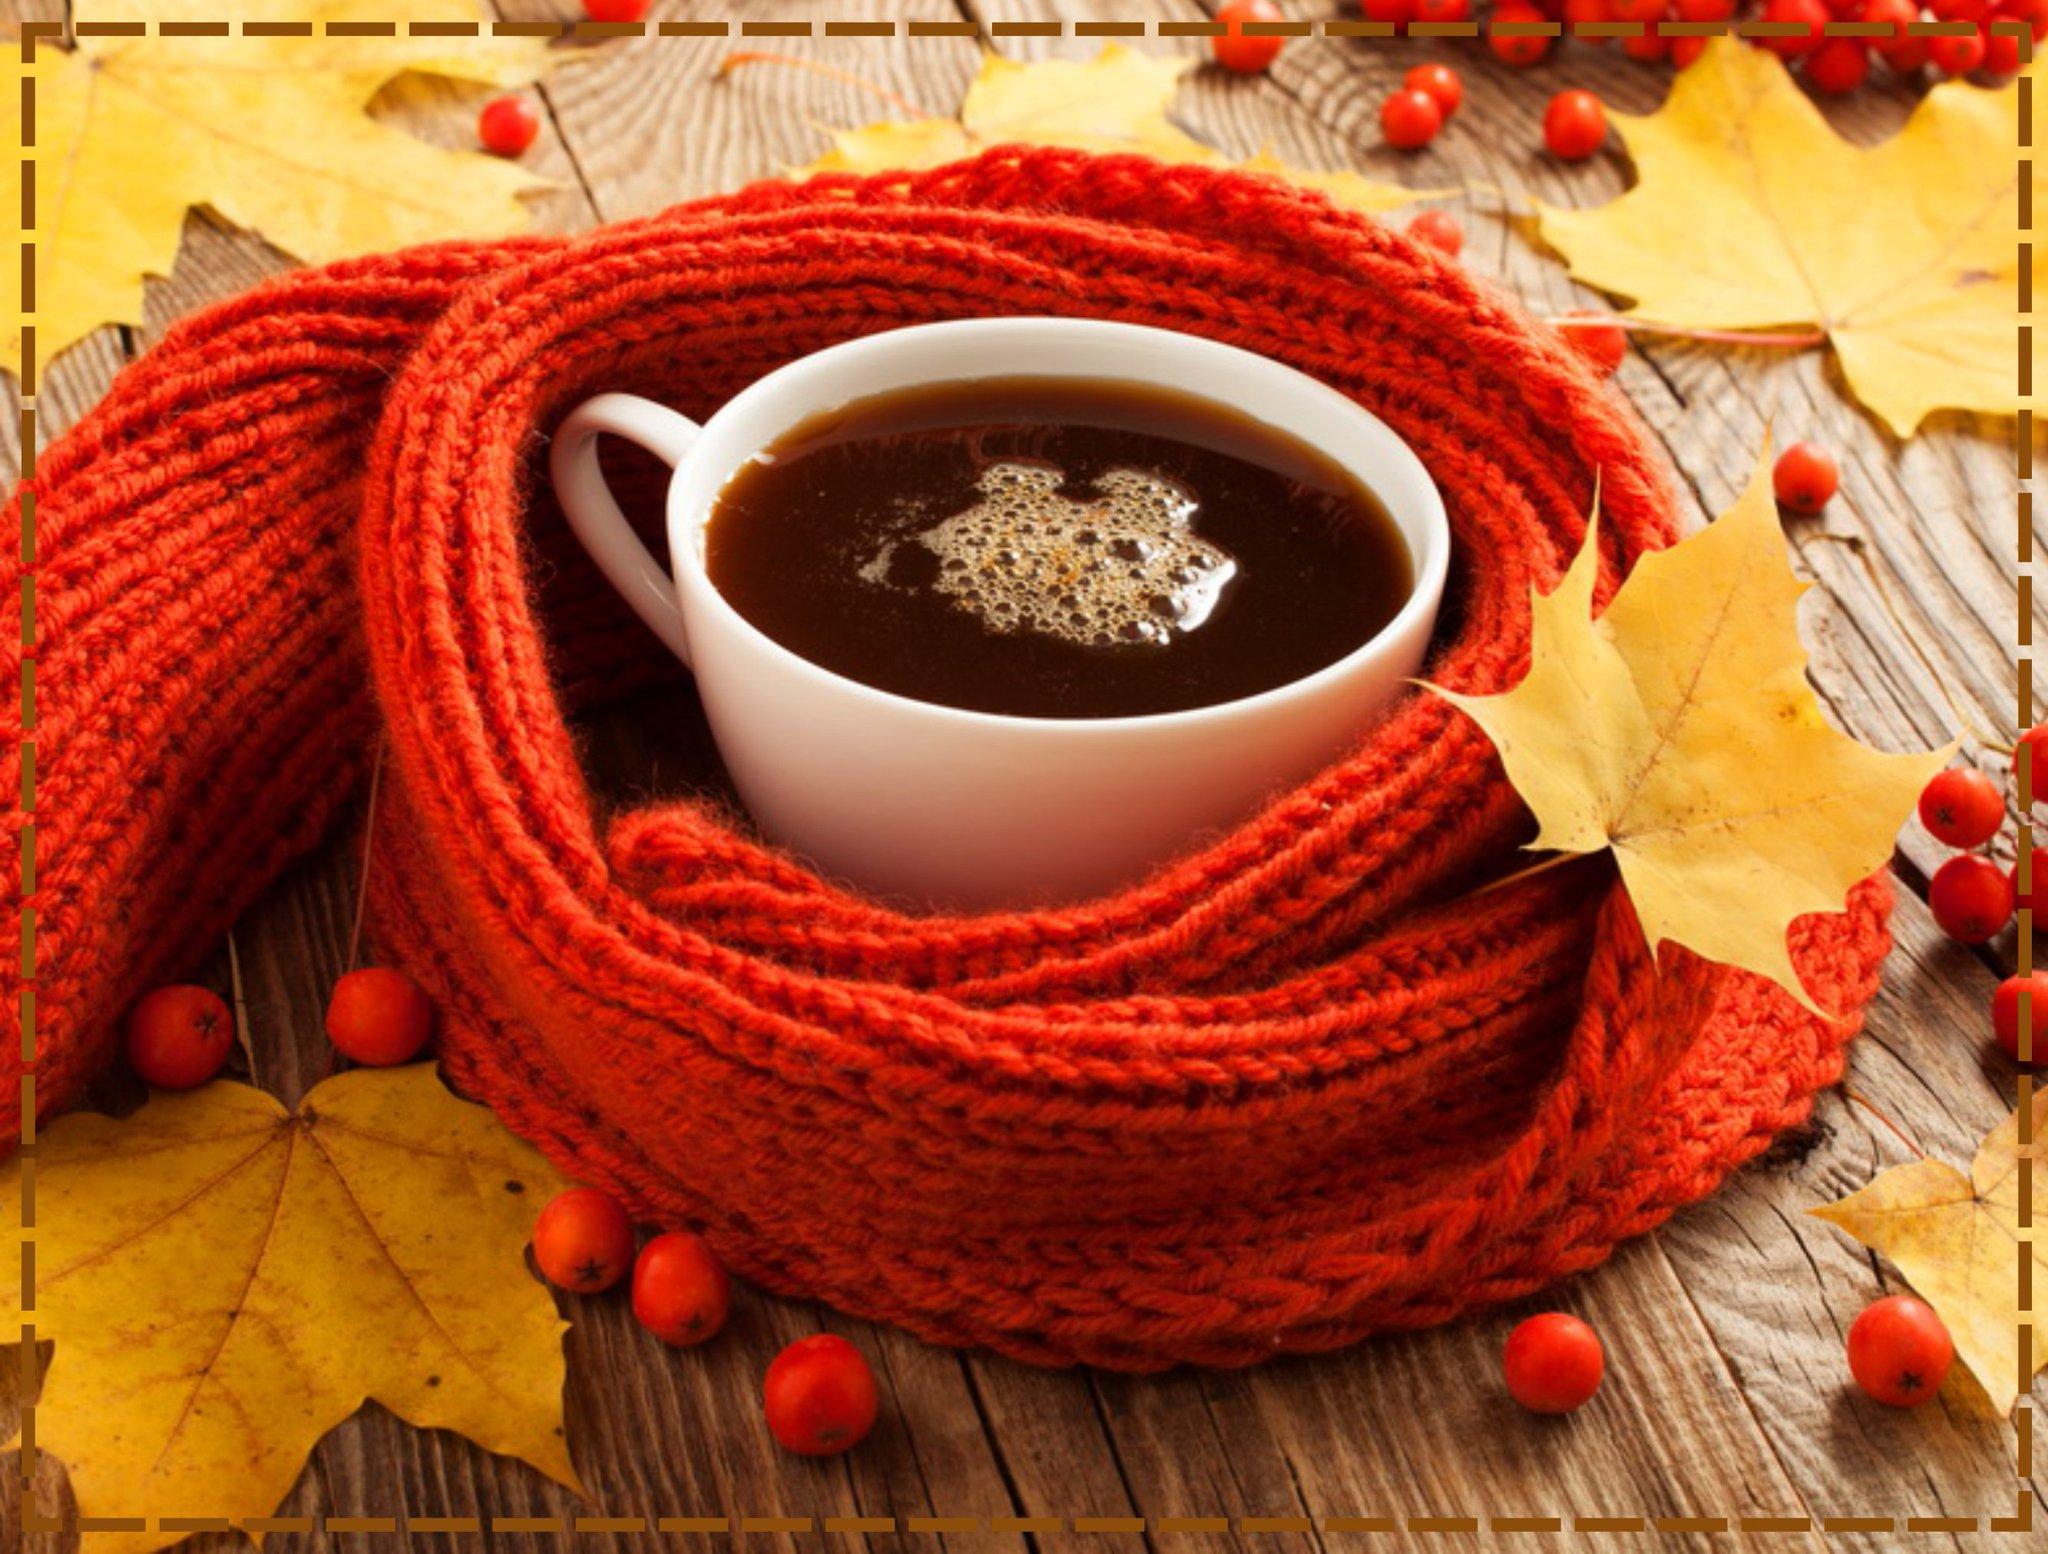 часто протекает картинки осень кофе и шоколад медведи крайне редко